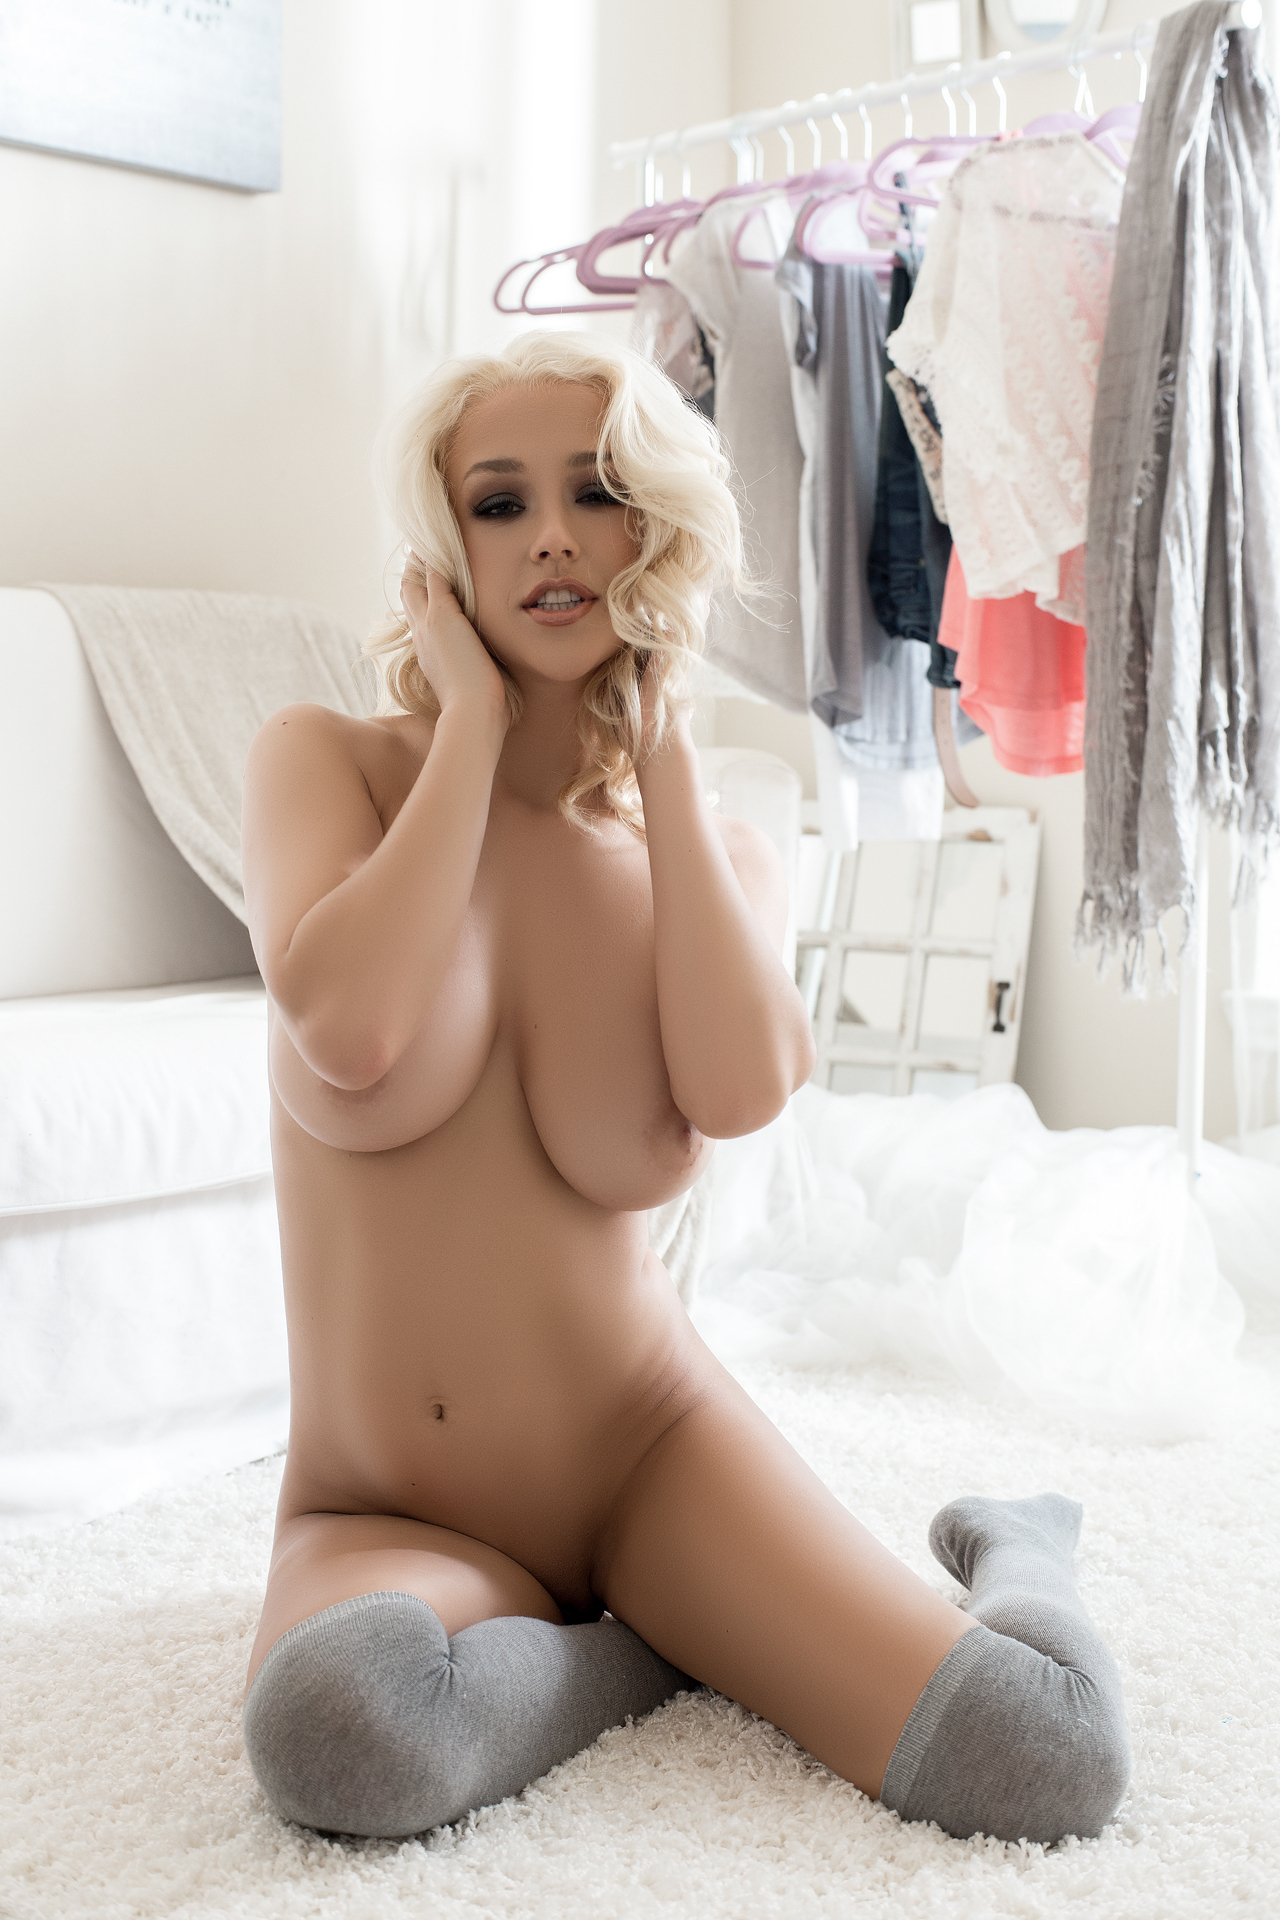 Bedroom flirt sabrina nichole playboy